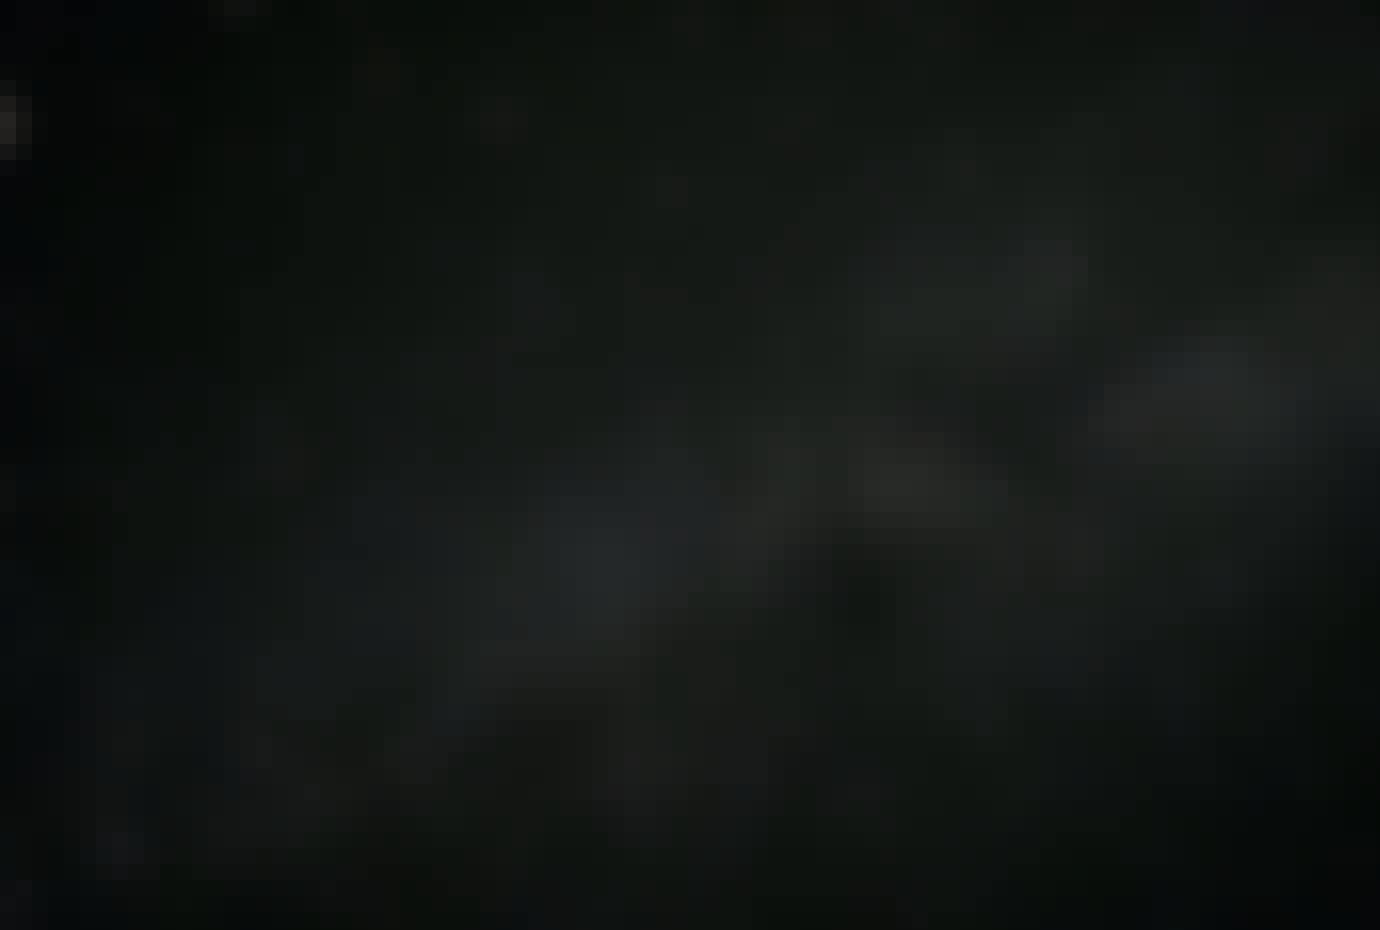 Mørkt stof i universet